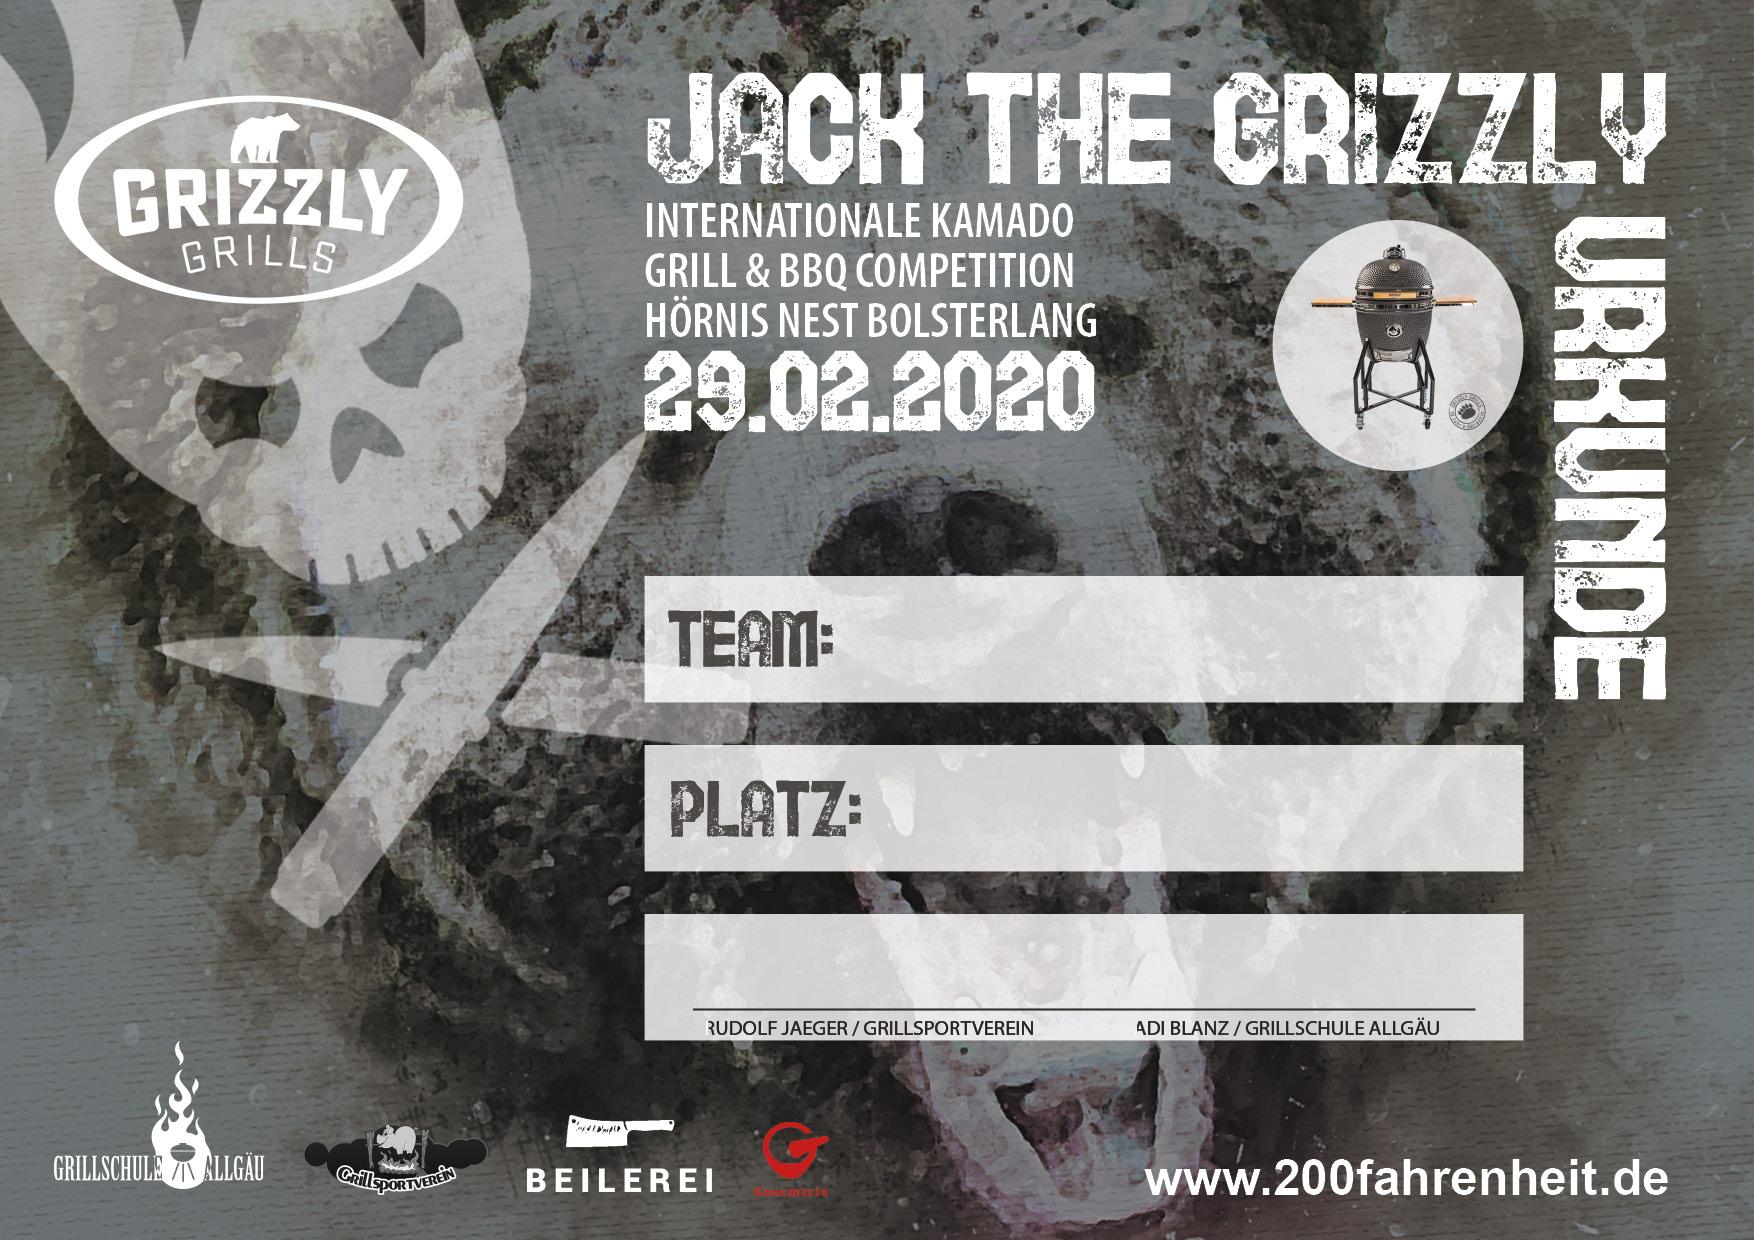 low-jackthegrizzly_urkunde_2020.jpg